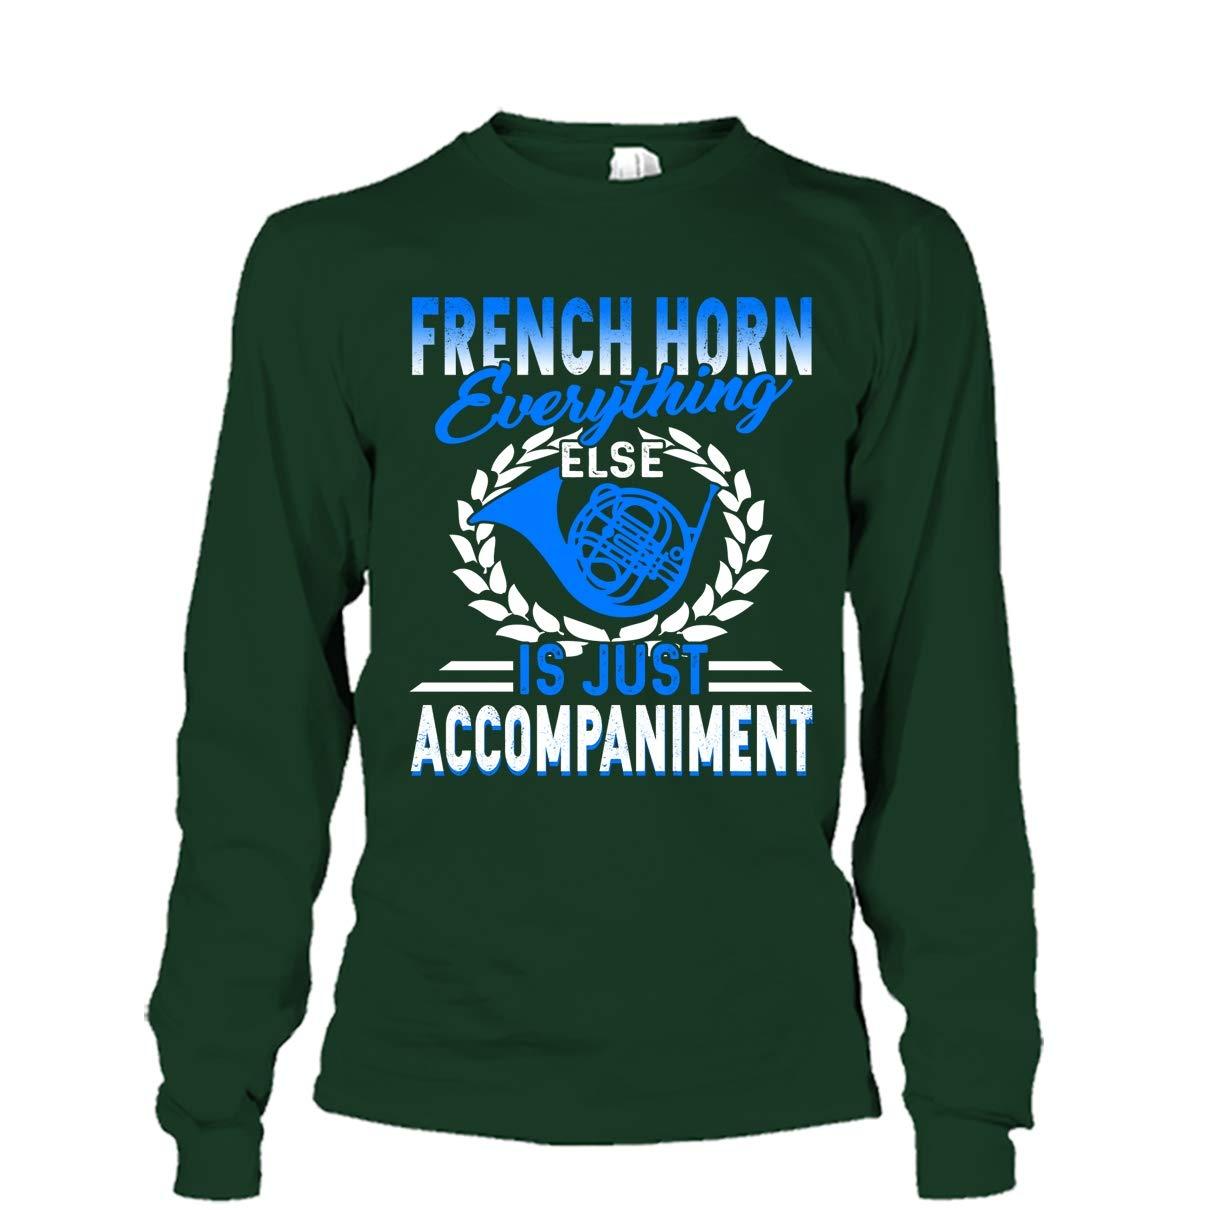 Mazoli French Horn Cool Tshirt Play French Horn Tee Shirt